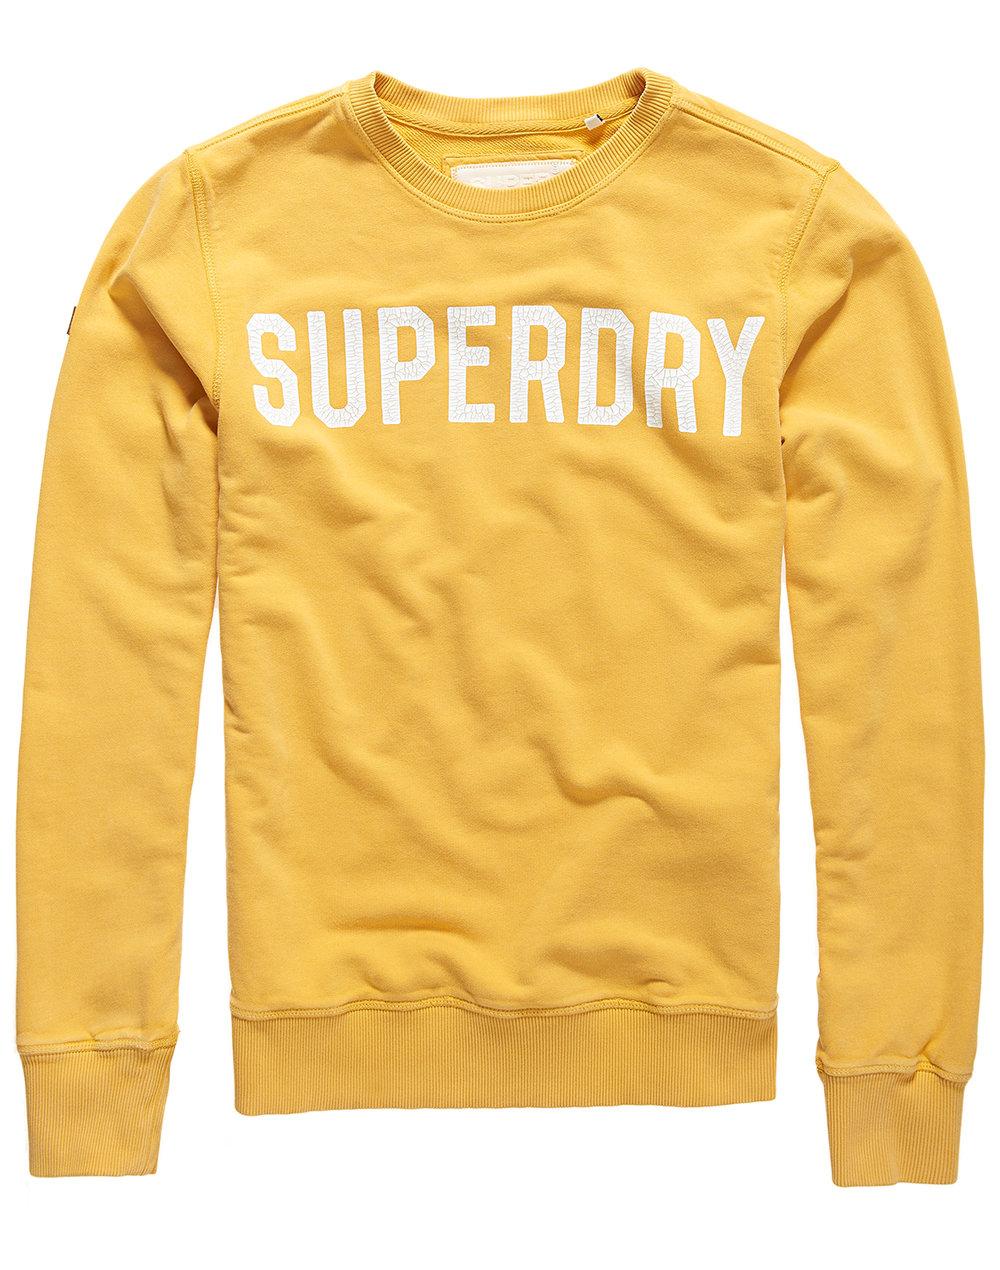 Superdry Solo Sport Crew Neck Sweatshirt - Gold - £44.99.jpg